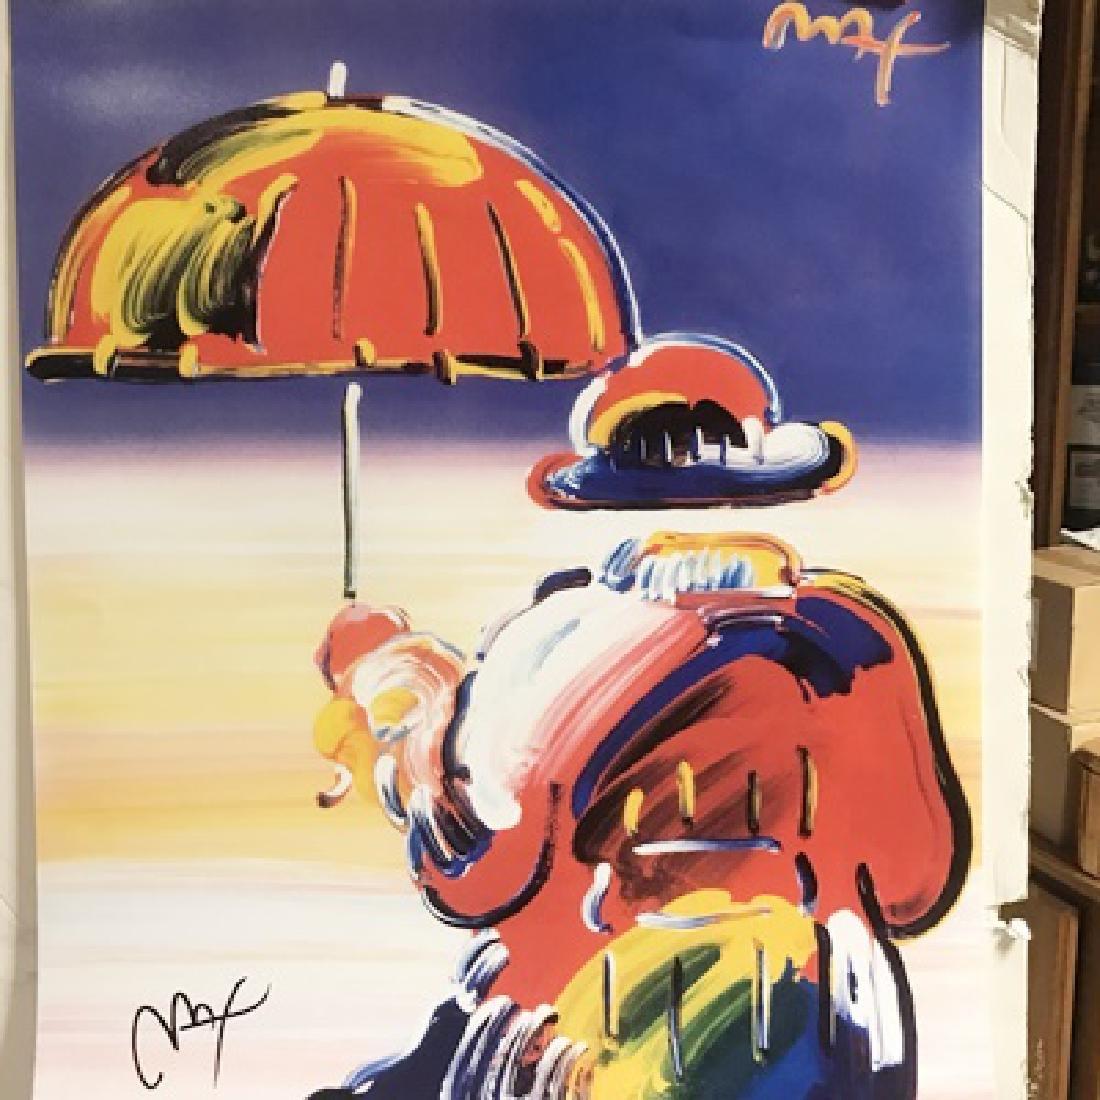 Peter Max Signed Lithograph - Umbrella Man